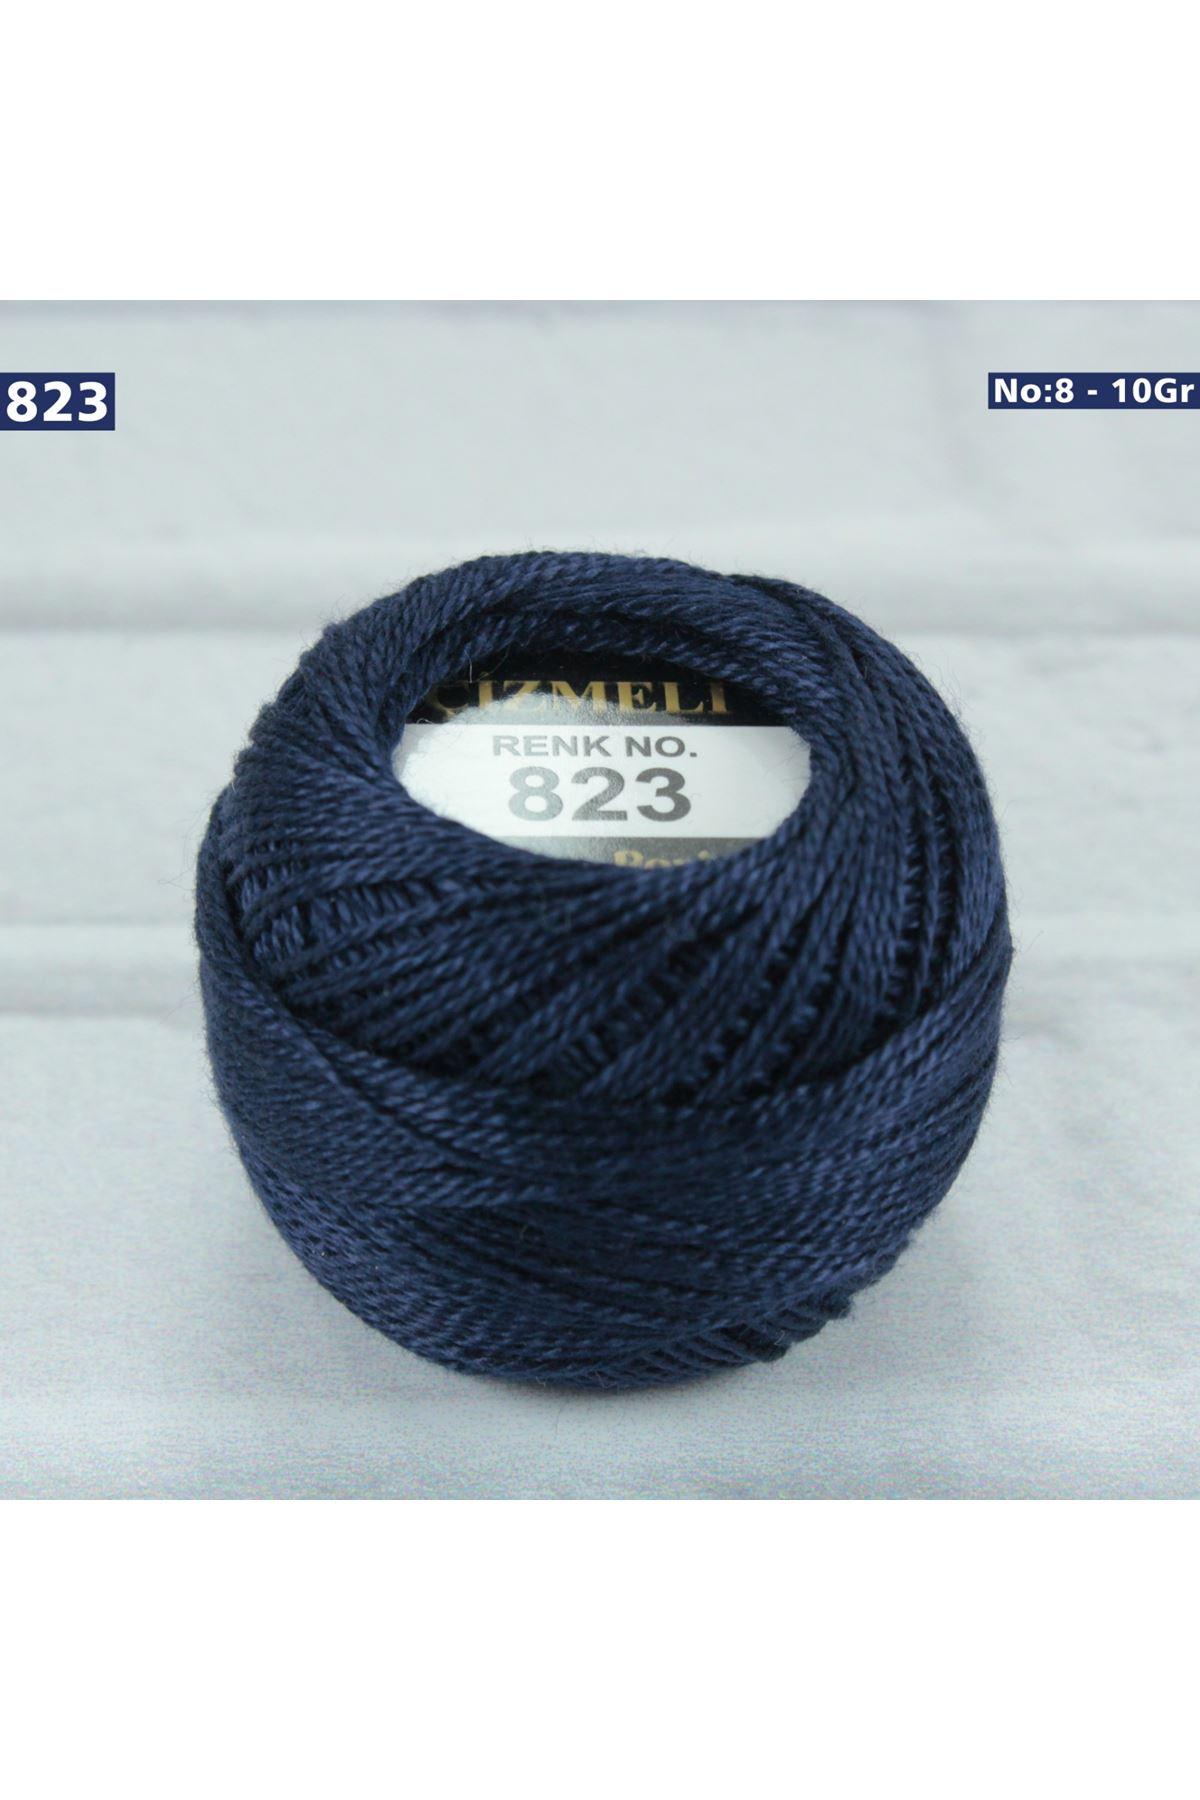 Çizmeli Cotton Perle Nakış İpliği No: 823